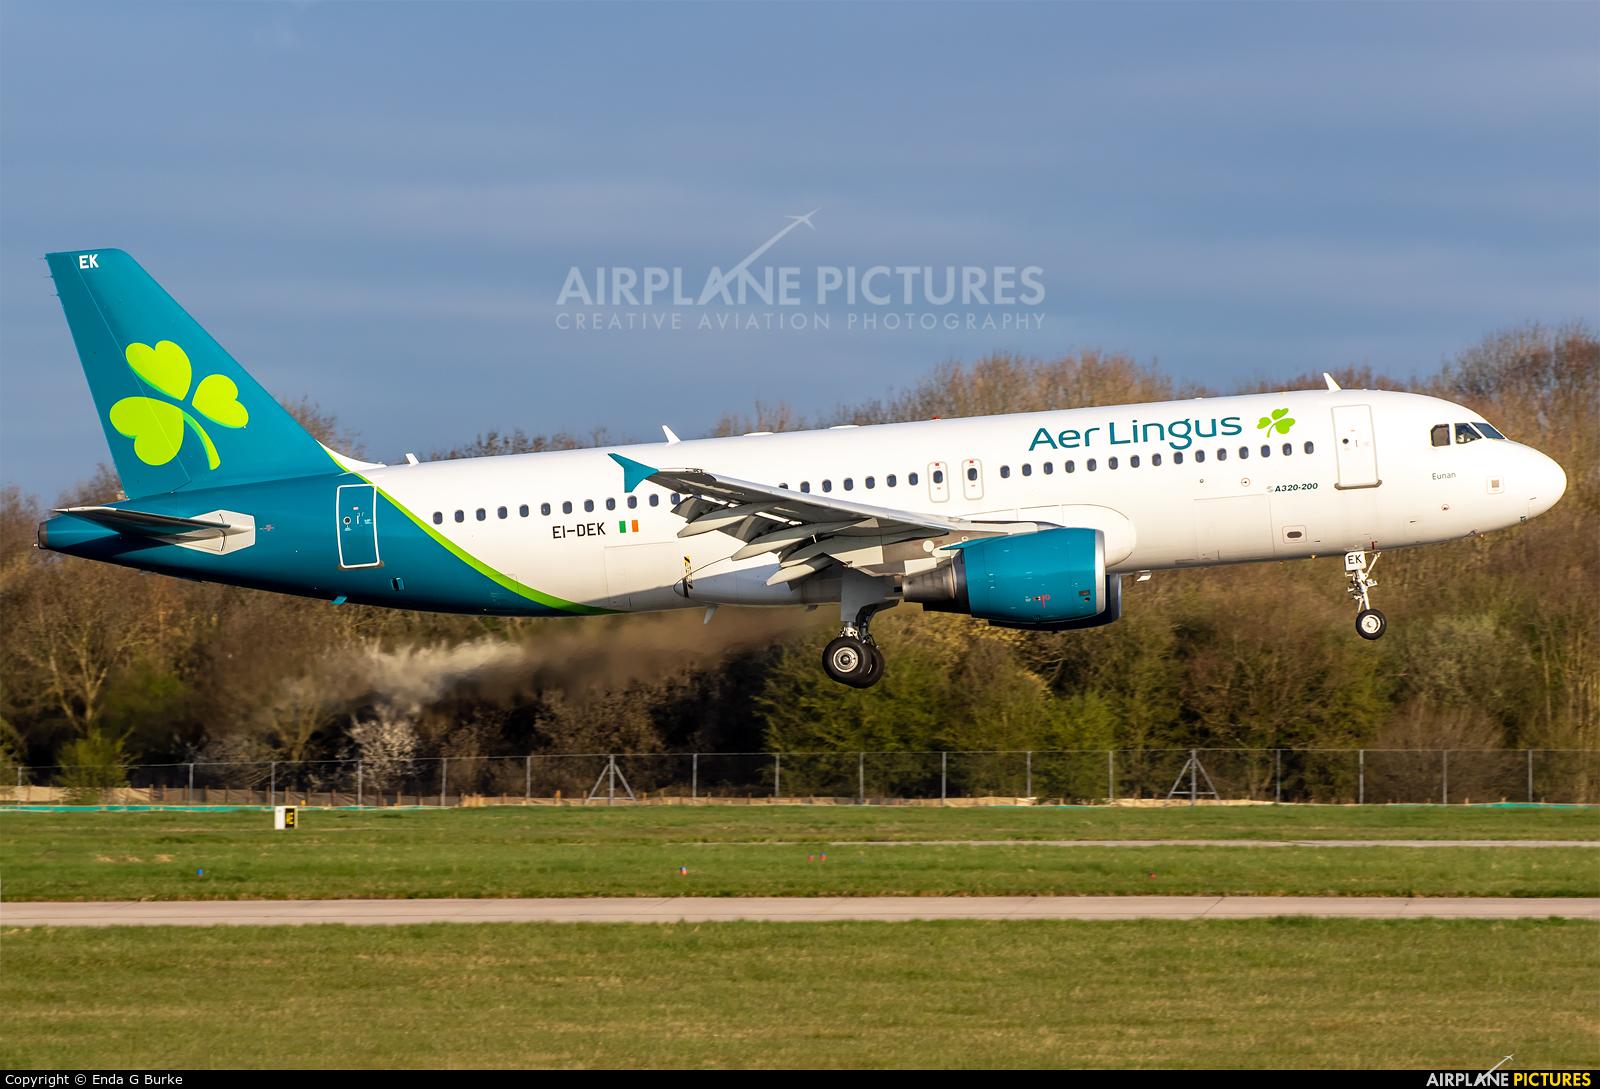 Aer Lingus EI-DEK aircraft at Manchester